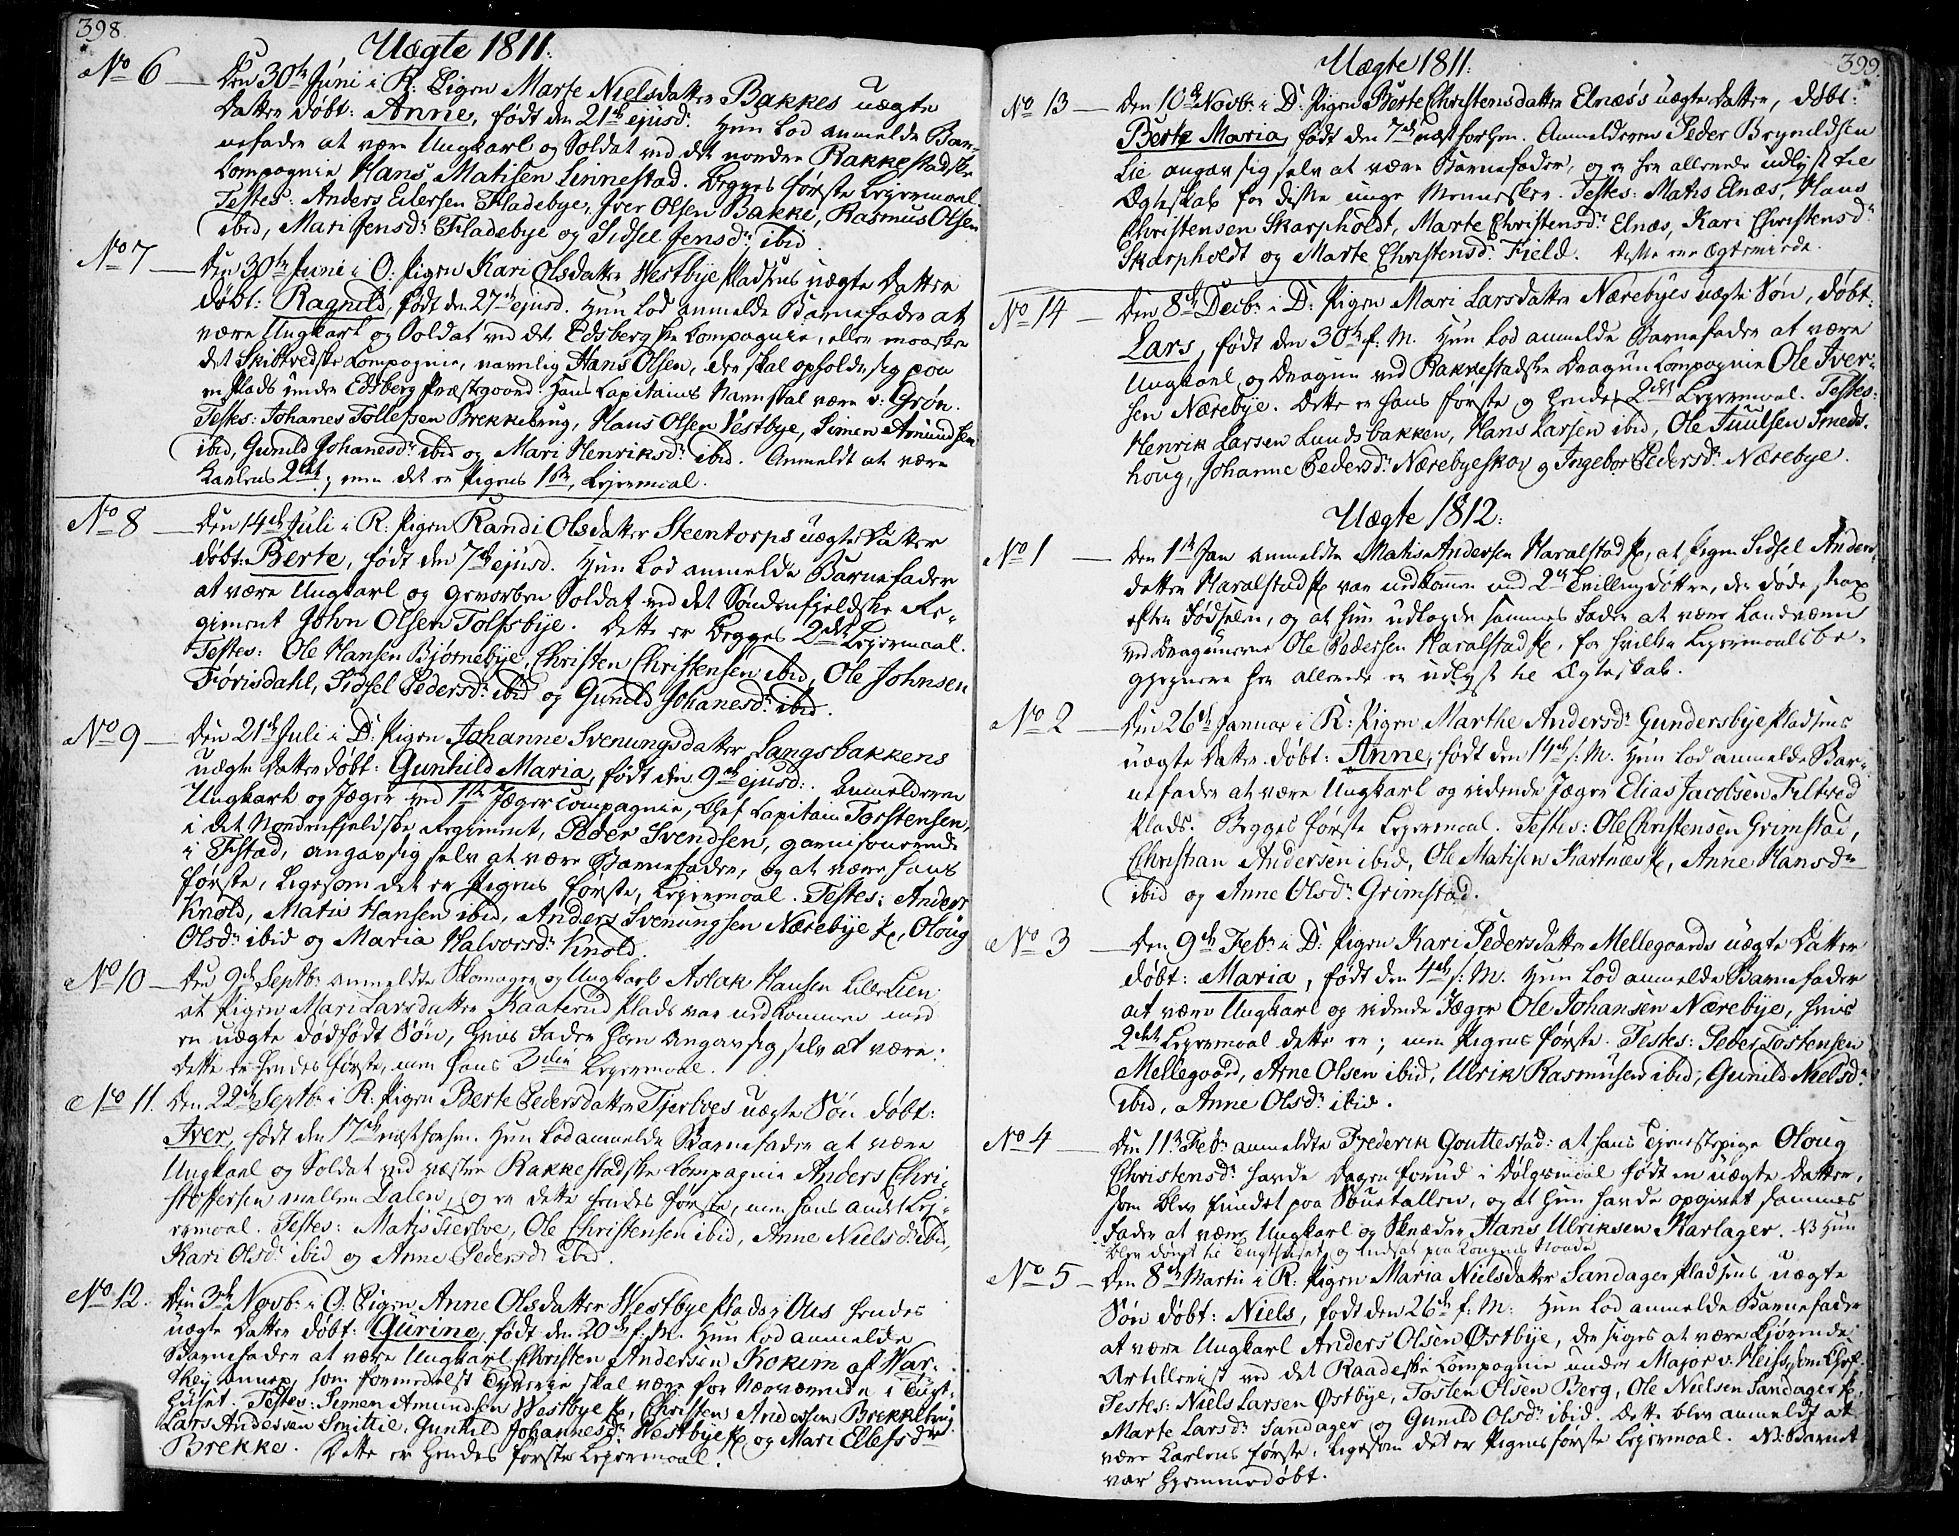 SAO, Rakkestad prestekontor Kirkebøker, F/Fa/L0005: Ministerialbok nr. I 5, 1784-1814, s. 398-399